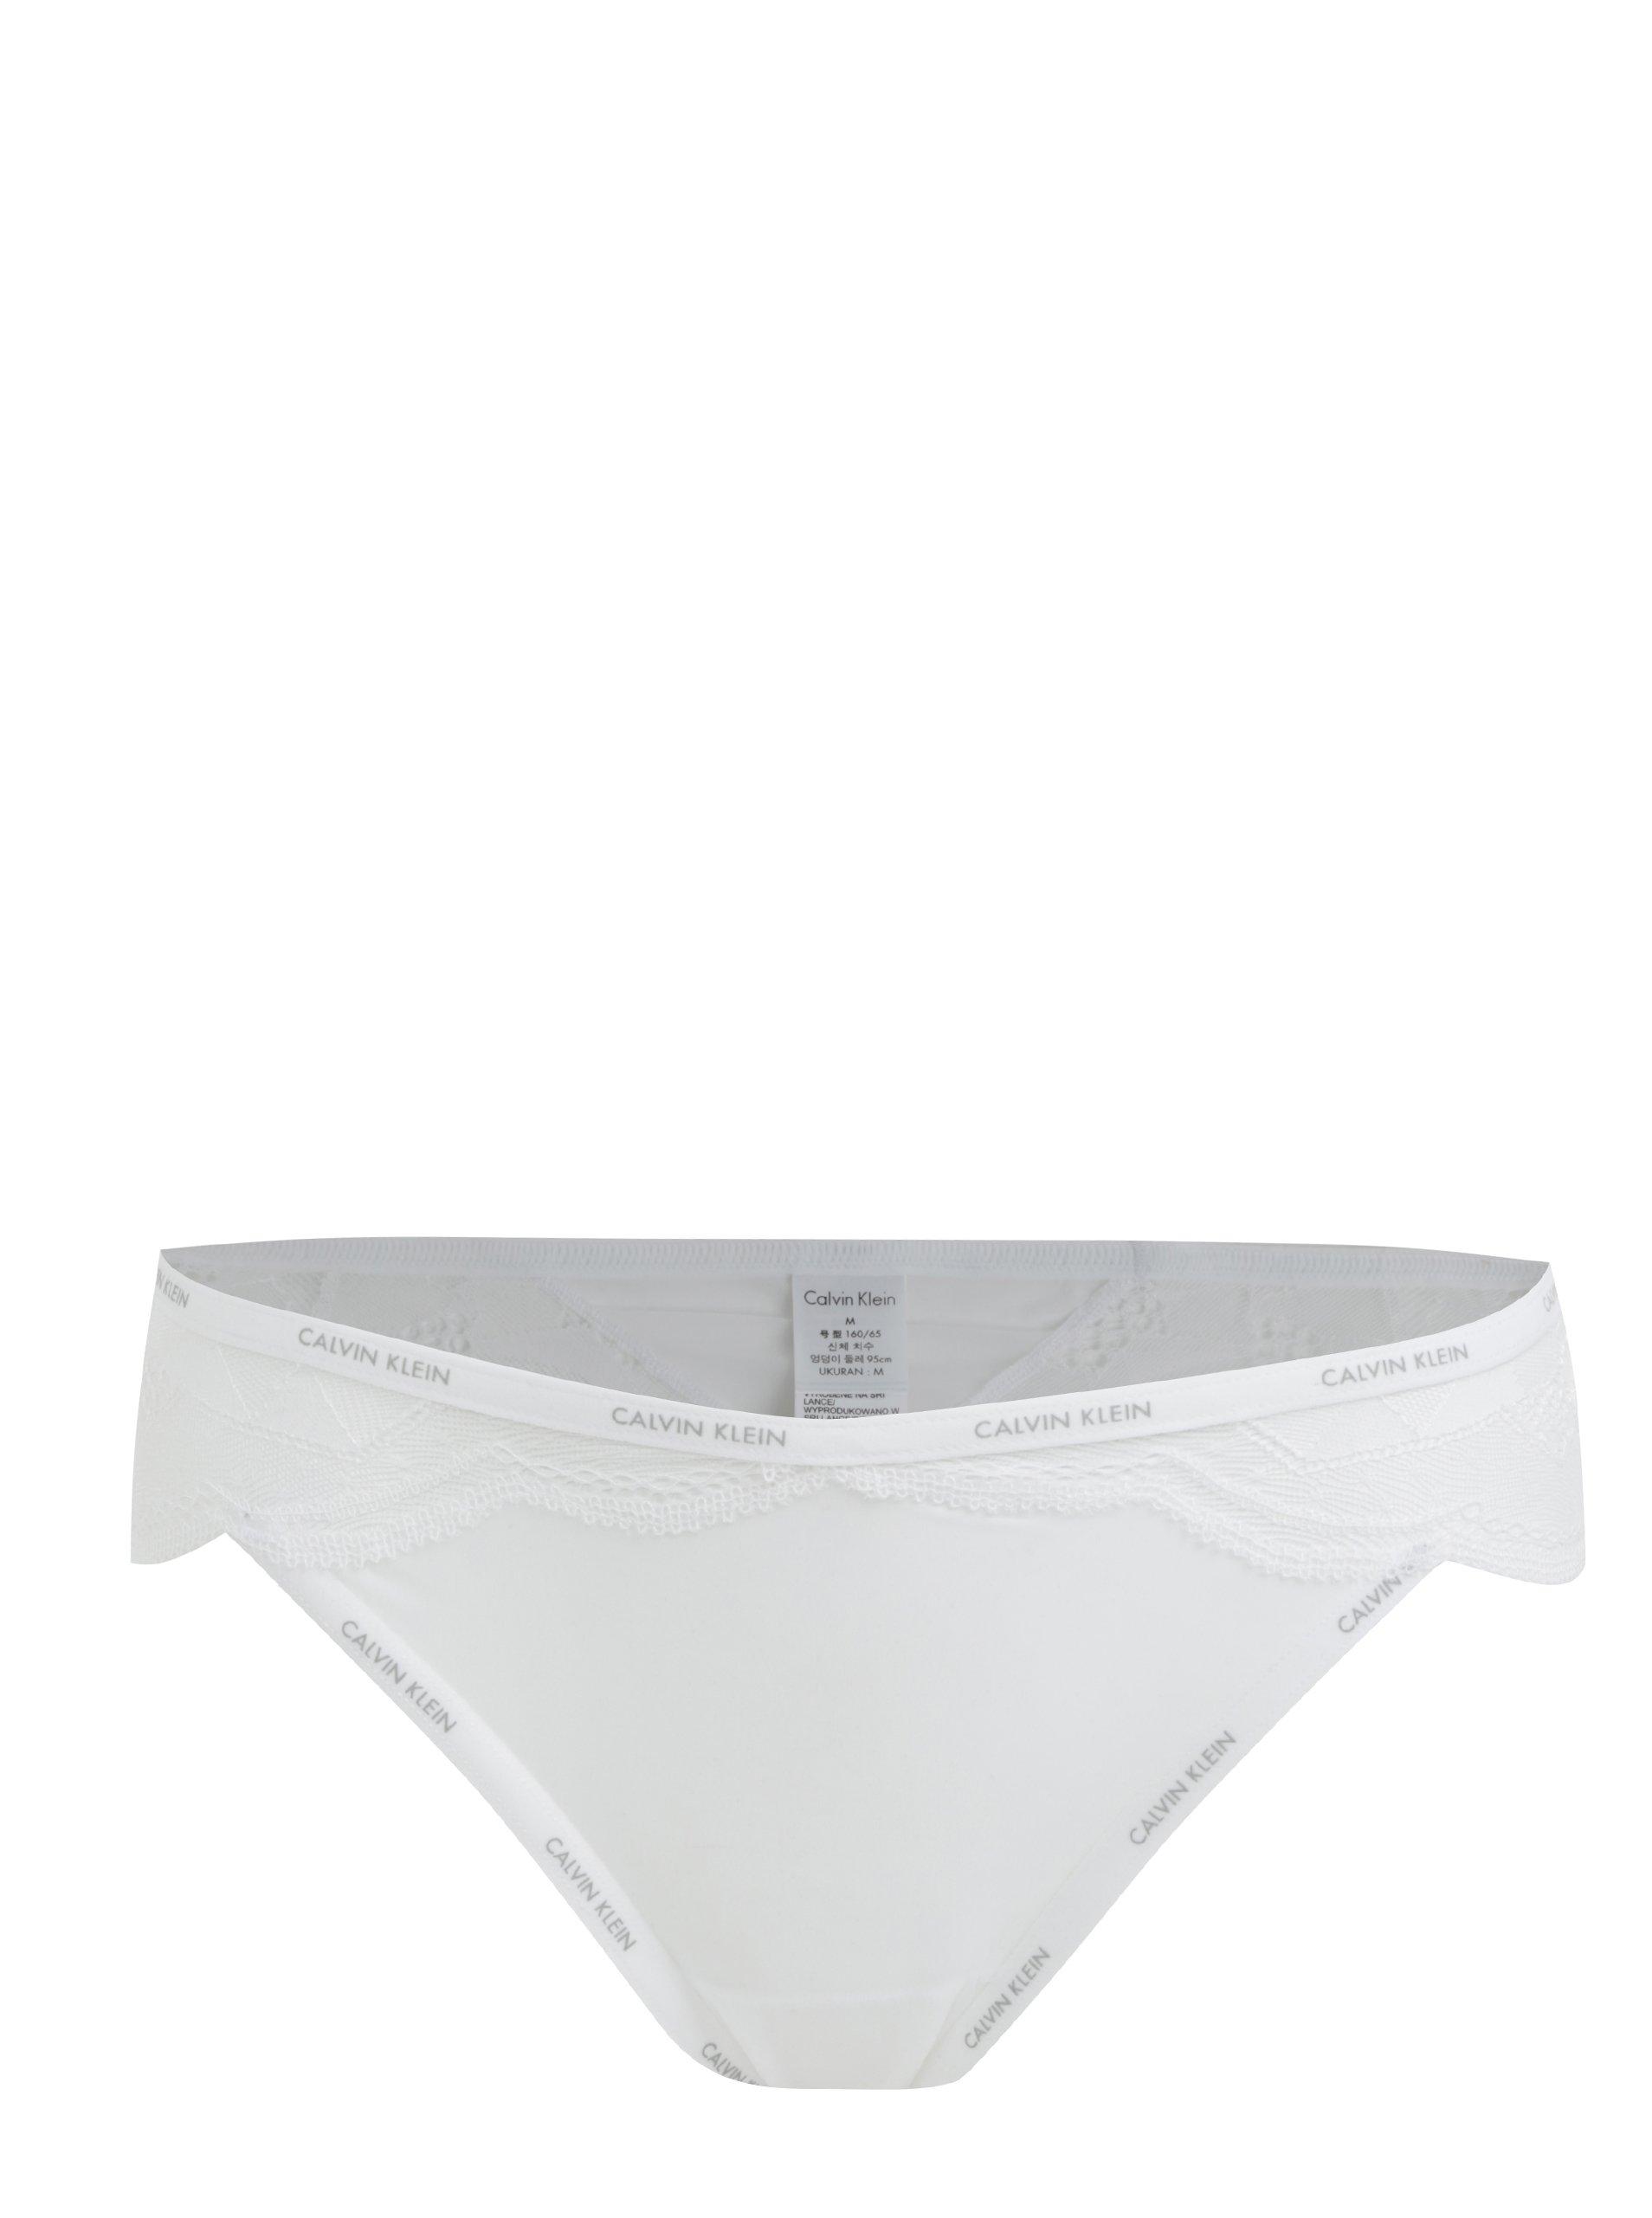 Fotografie Bílé krajkové dámské kalhotky Calvin Klein Underwear